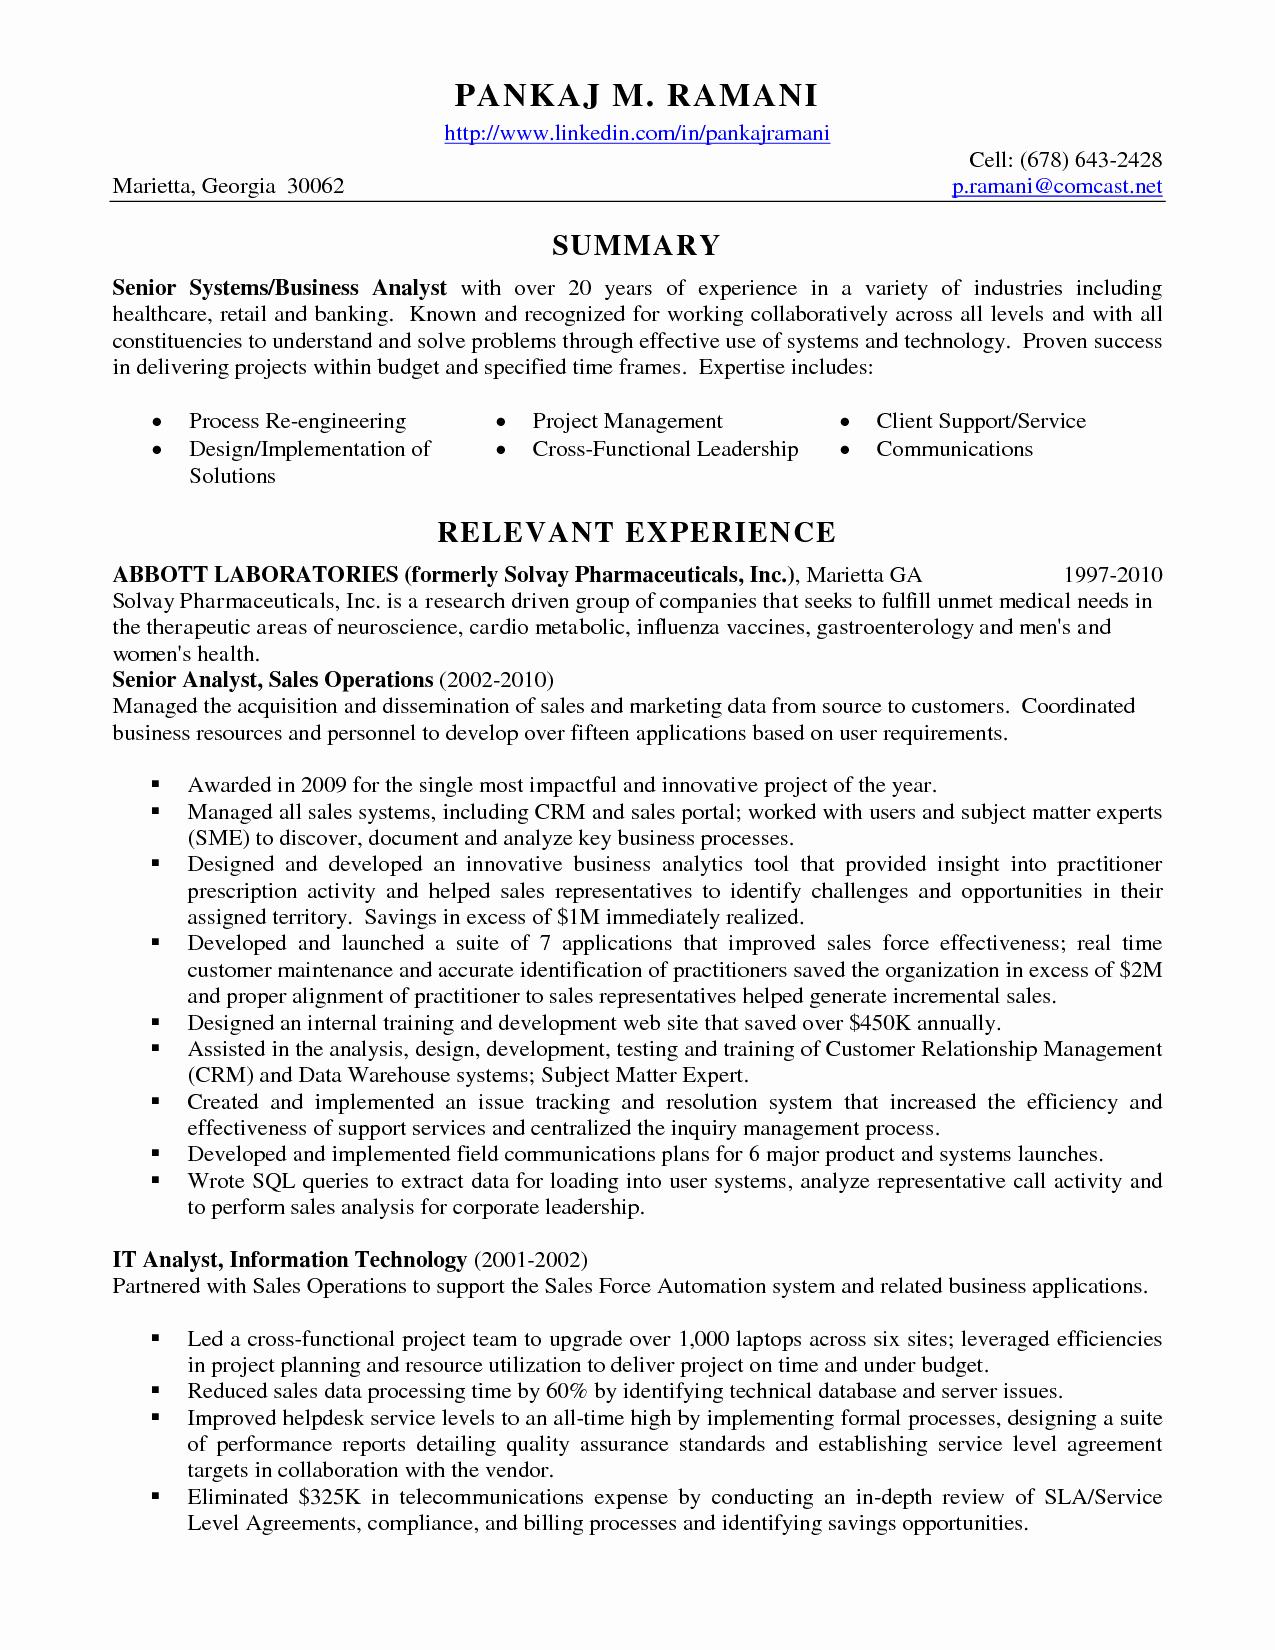 Software Configuration Management Analyst Resume